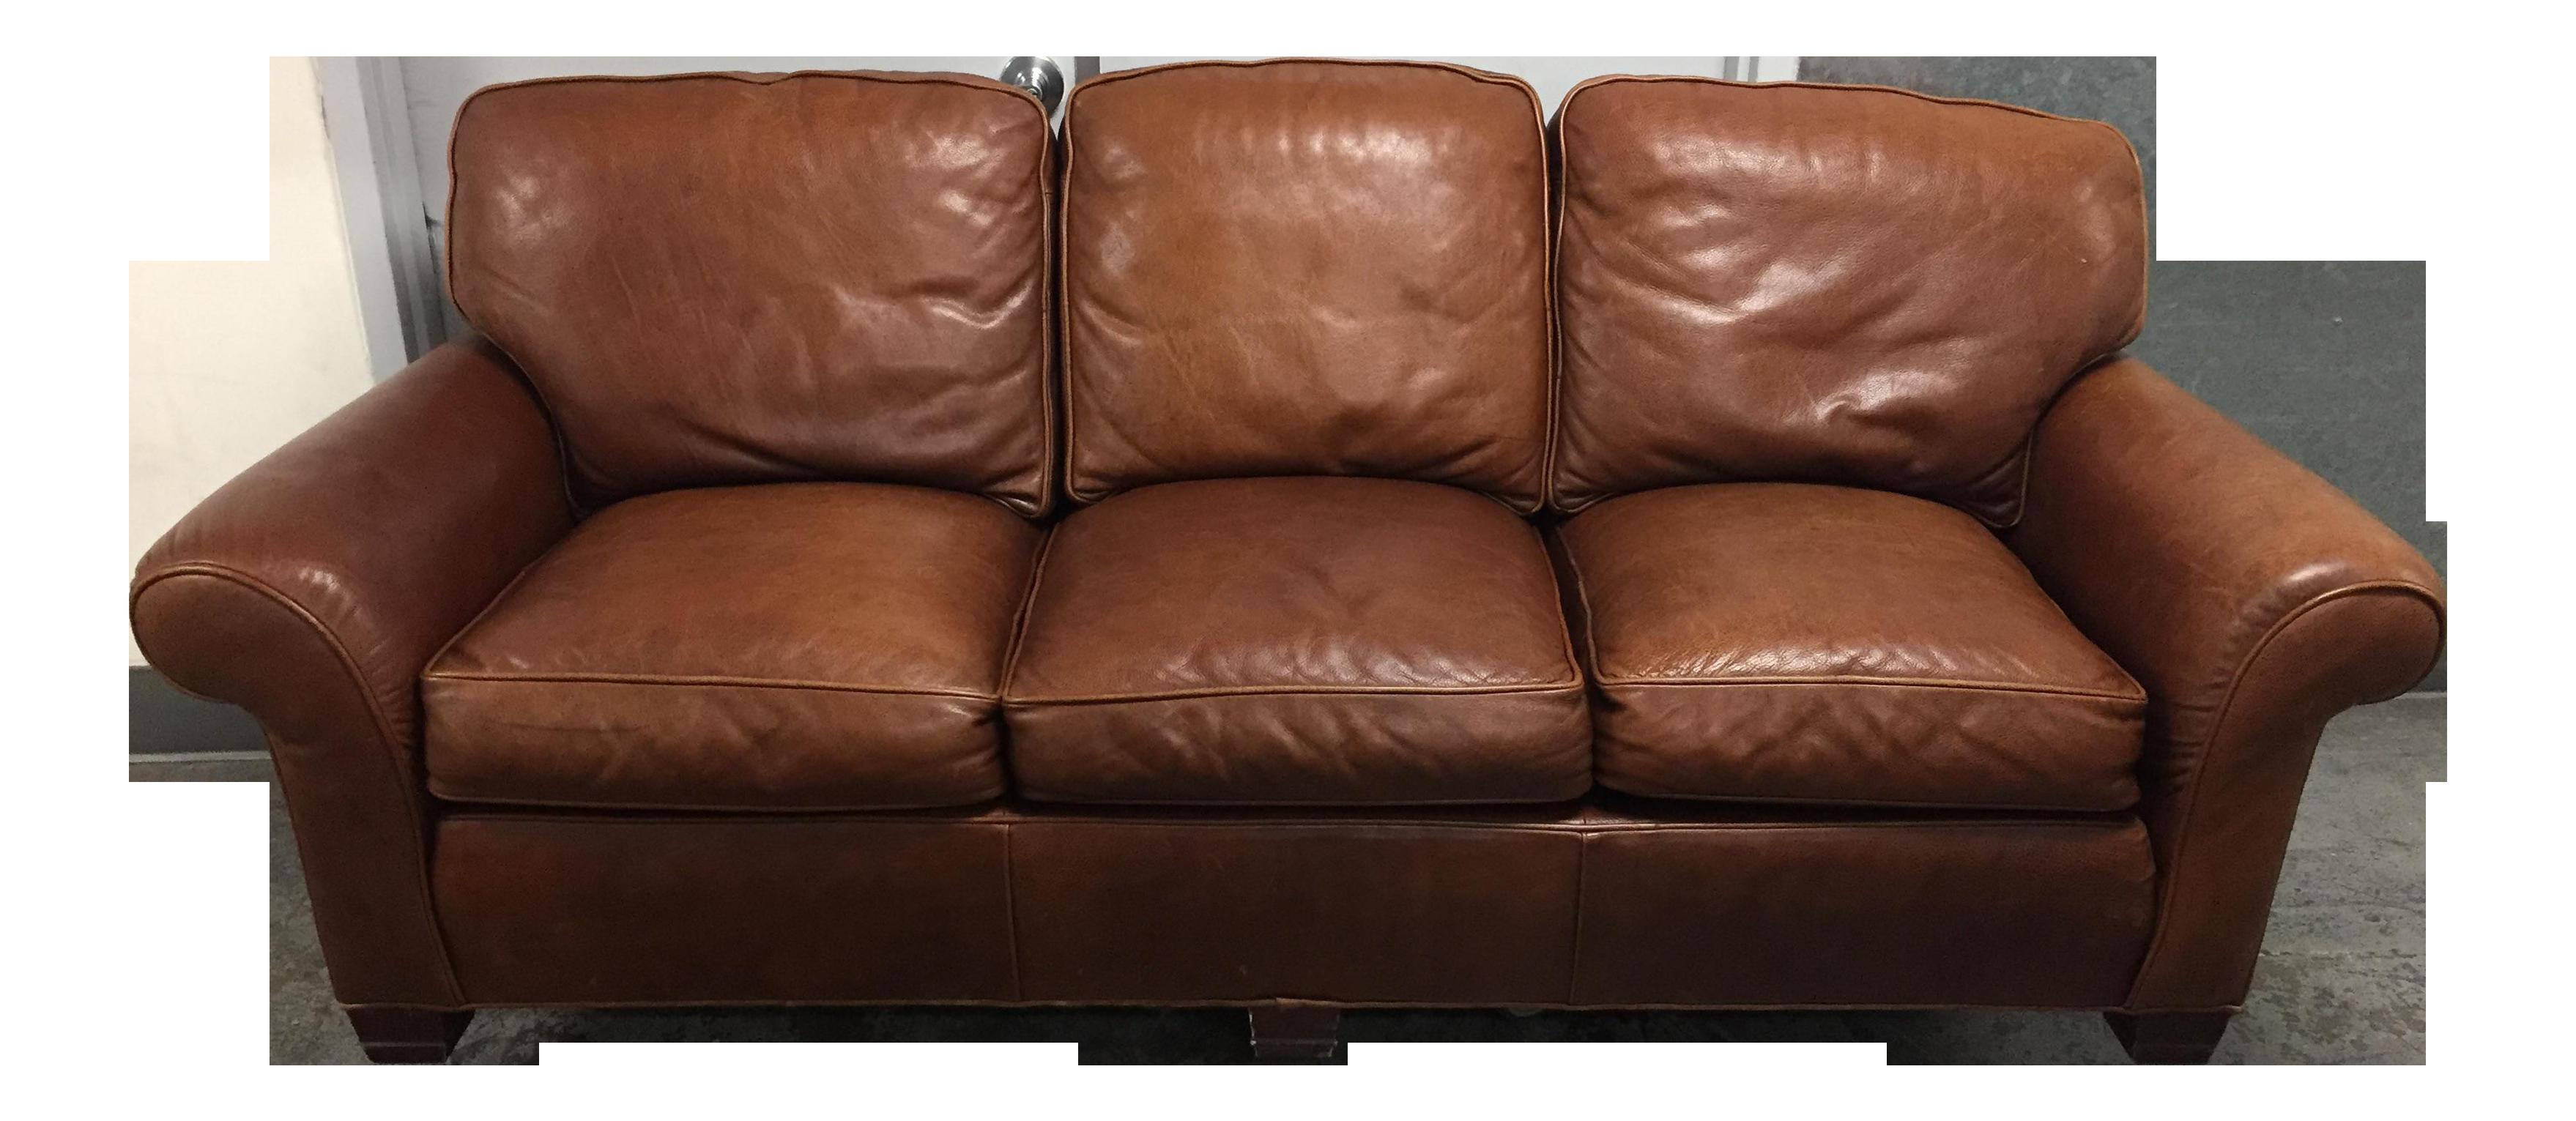 Whittemore Sherrill Ltd Distressed Leather Sofa Chairish